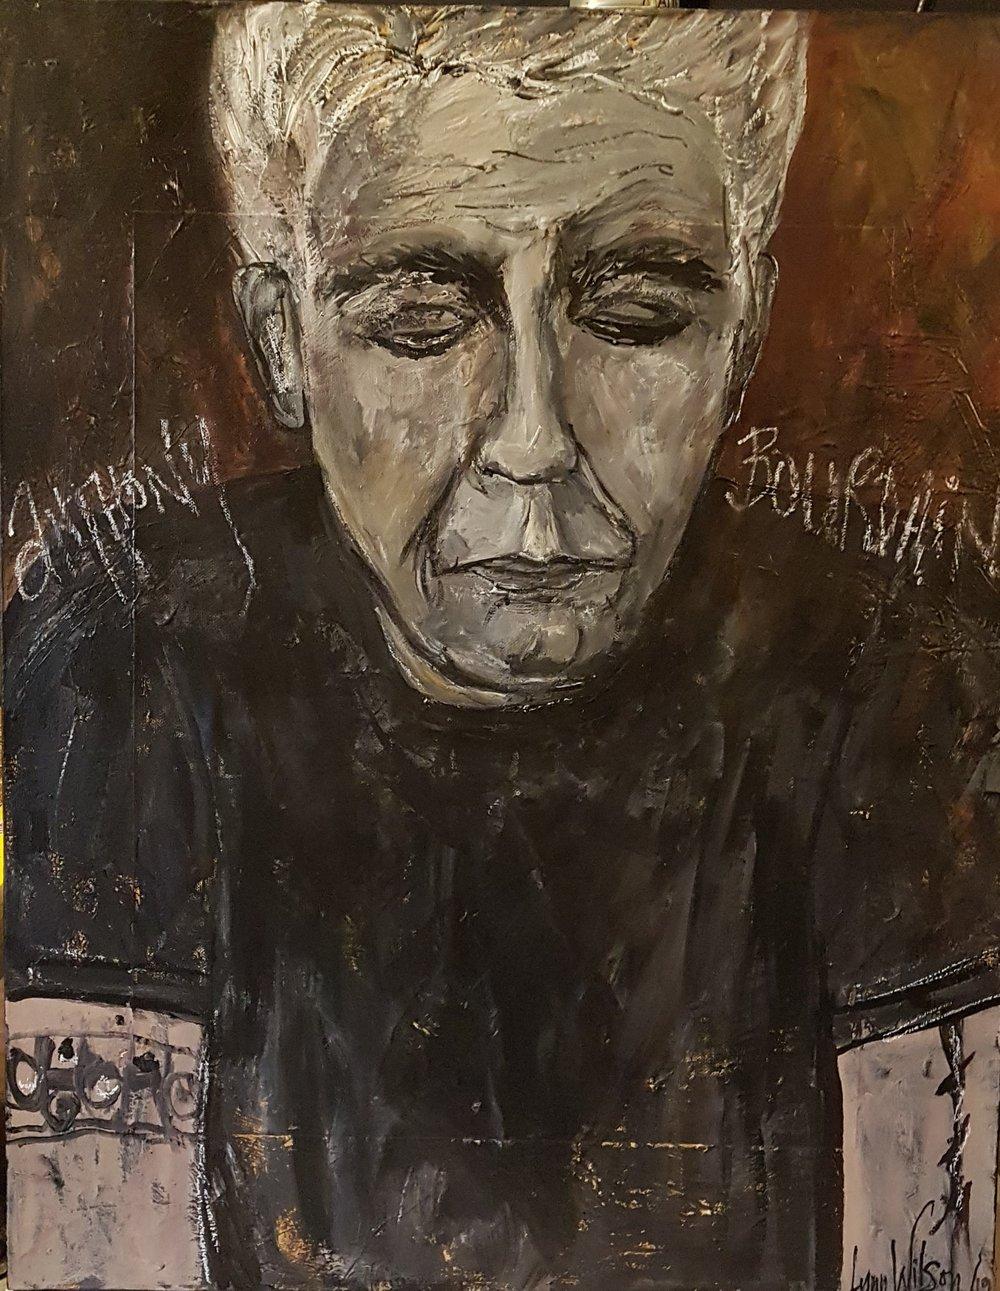 Anthony Bourdain Jan 2019 .jpg